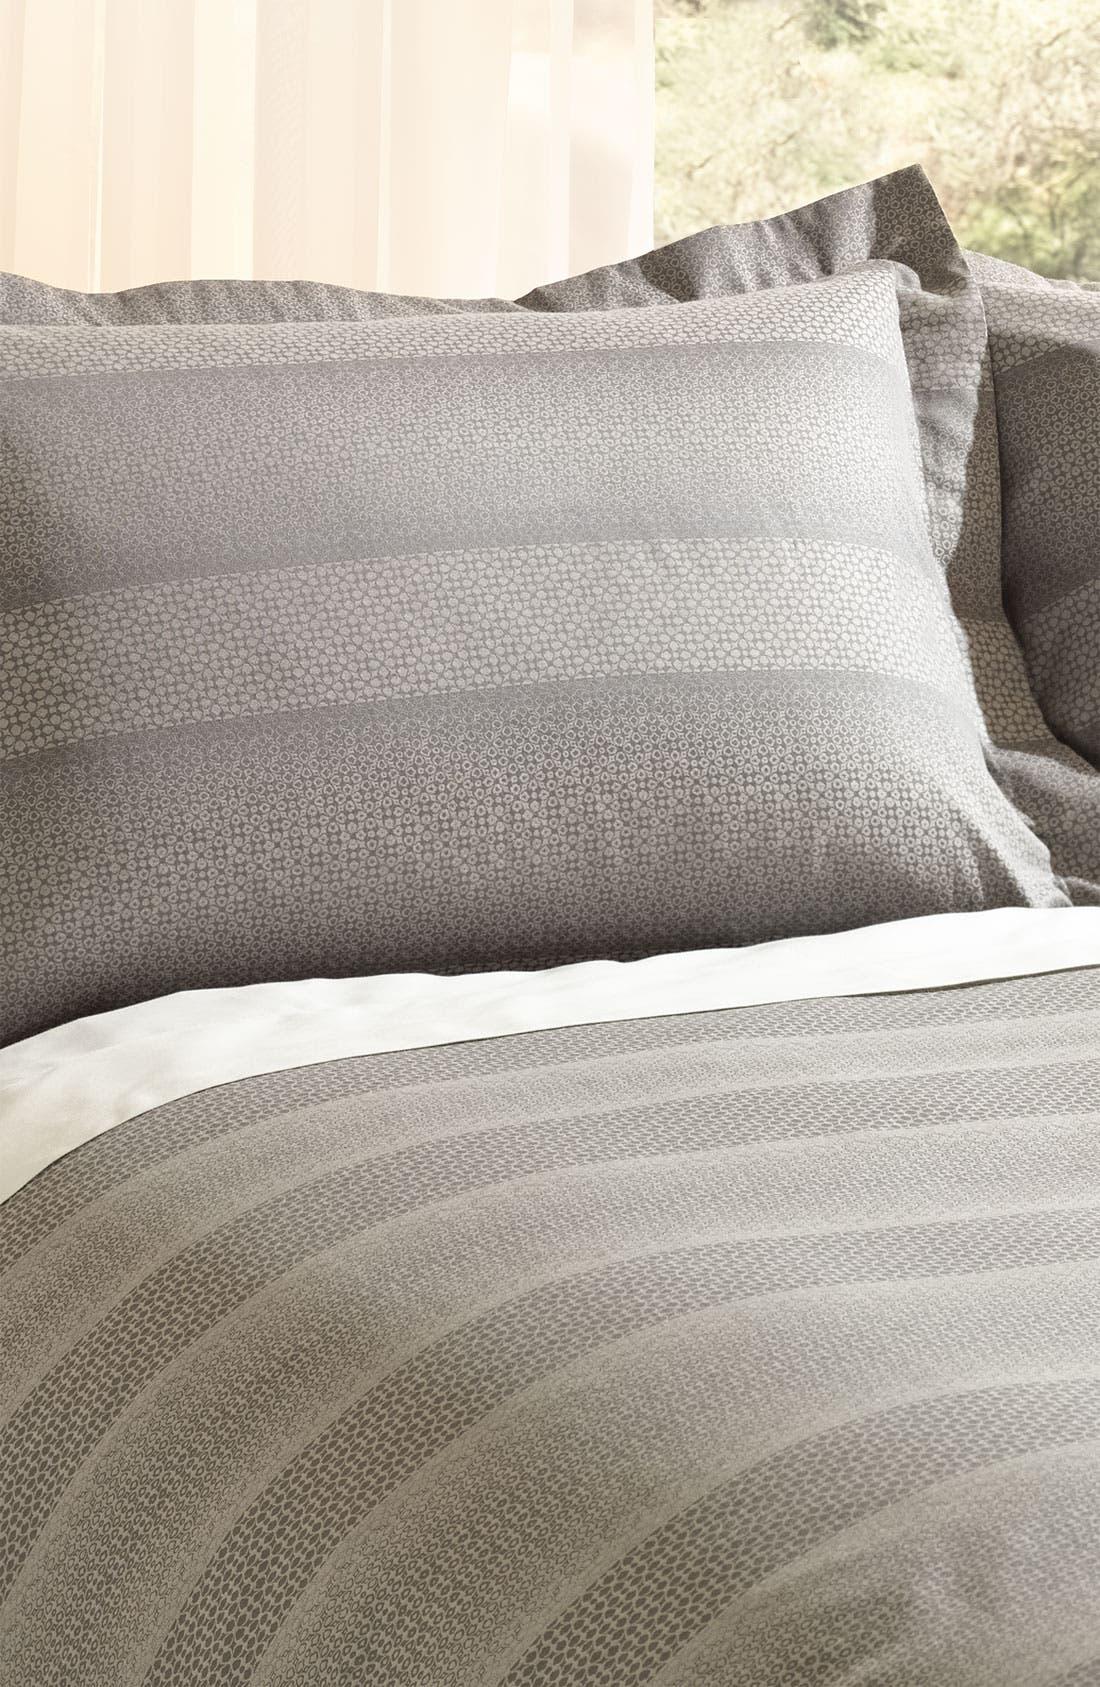 Alternate Image 1 Selected - Nordstrom at Home 'Origami' Stripe Sham